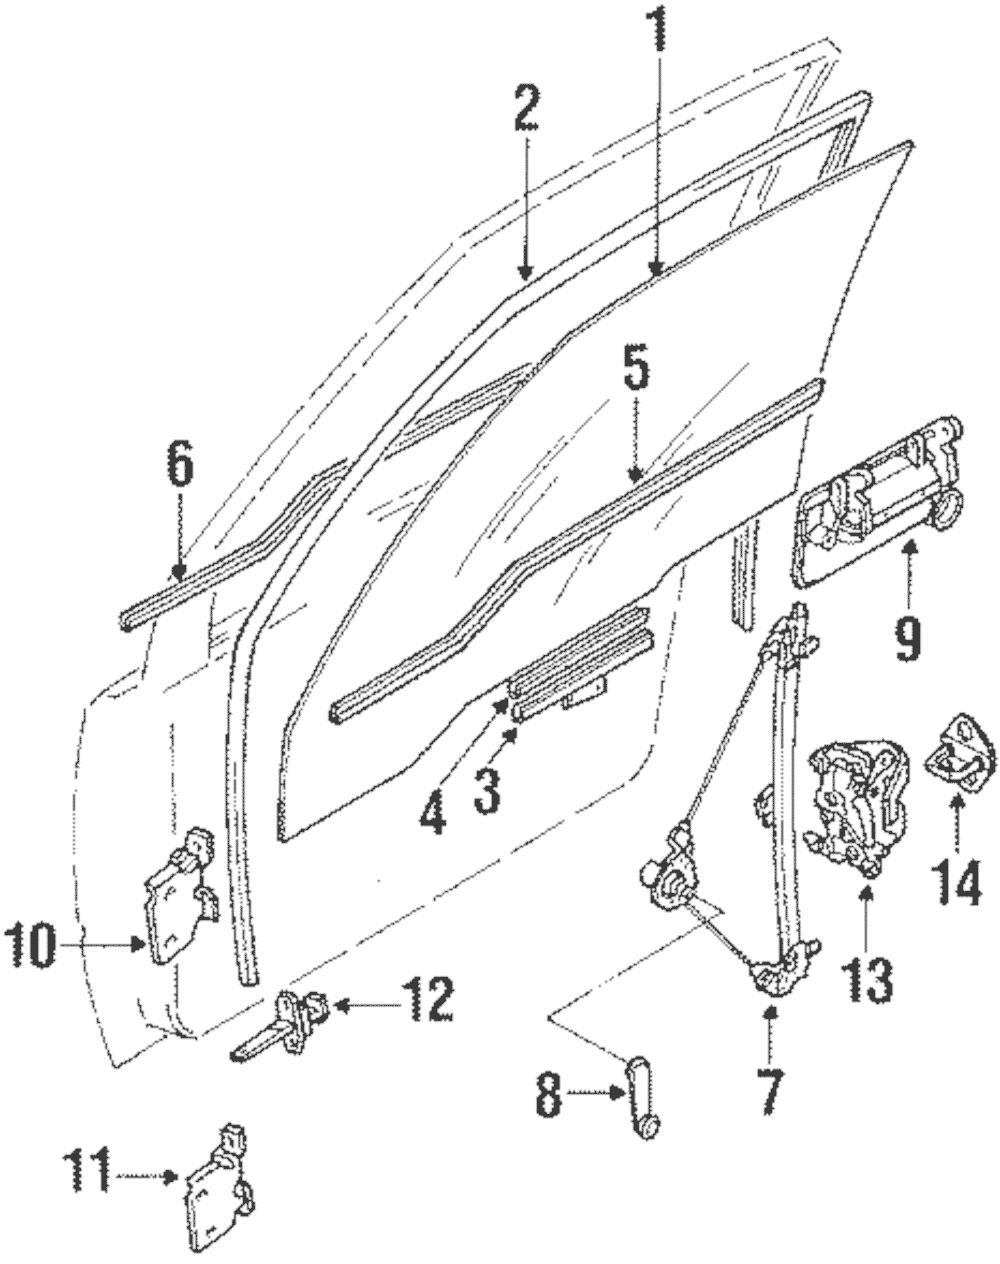 OEM Genuine GM Manual Window Regulator 1998 Chevrolet